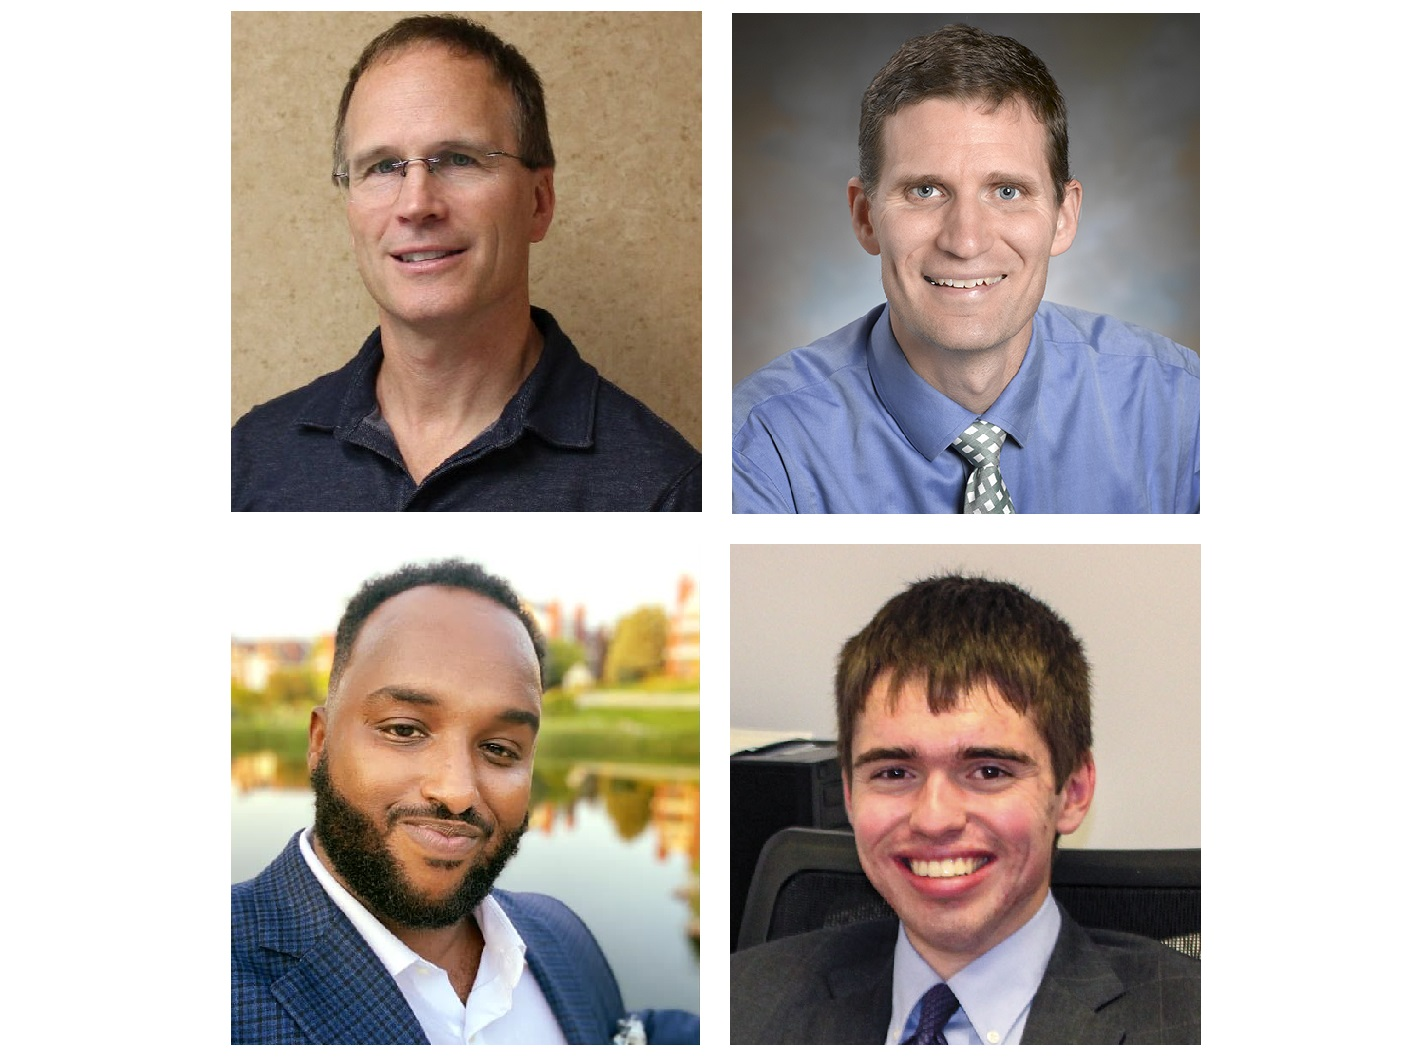 Top row: John Blowers, Dr. William Fife. Bottom row: Mustafa Nuur, Benjamin Pontz.